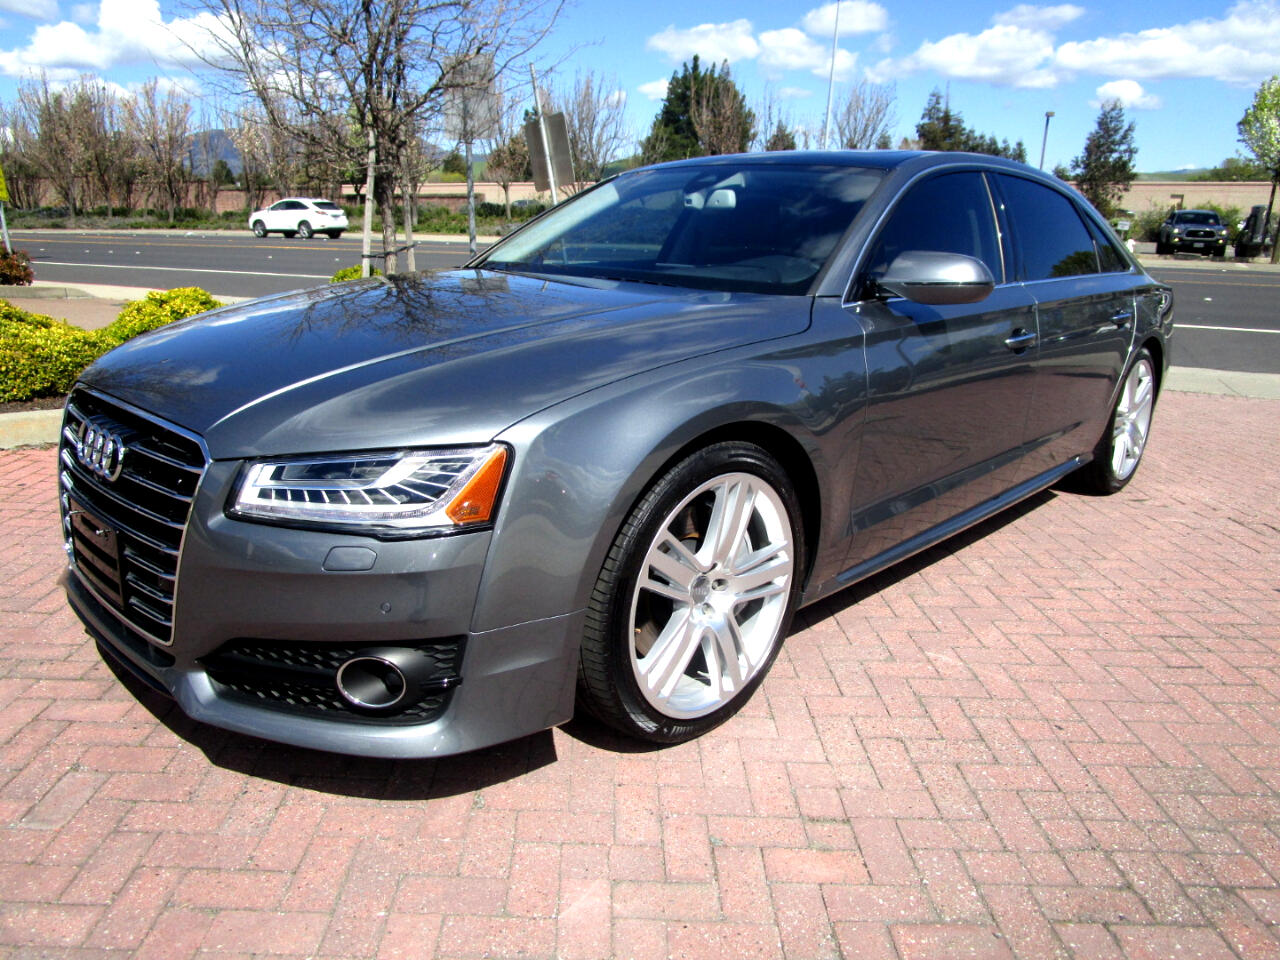 2016 Audi A8 L SPORT PKG QUATTRO*HEAT/AC SEATS*DRIVER ASSIST*